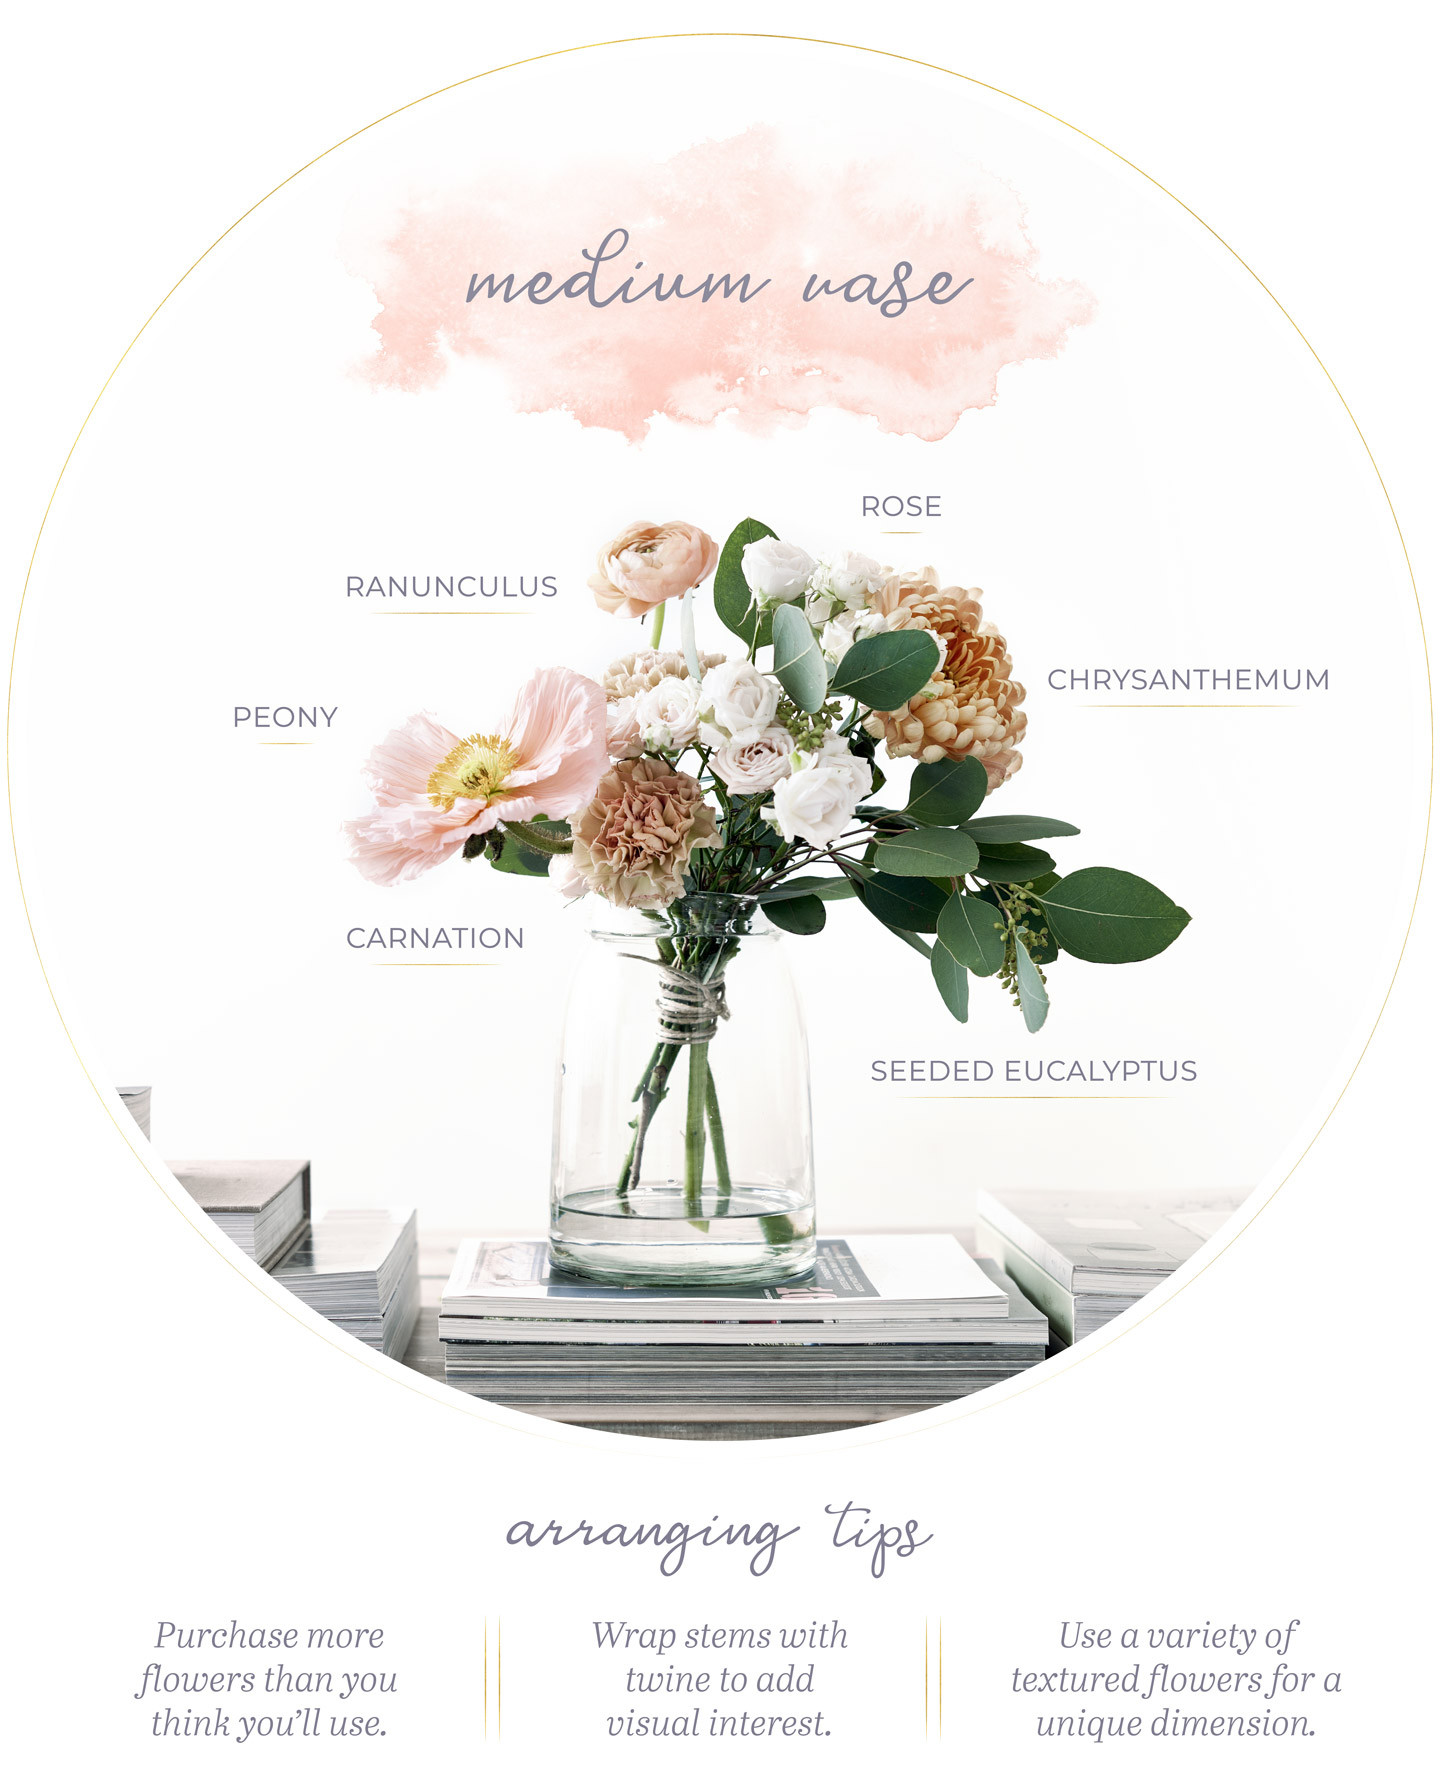 ftd cross vase of how to arrange flowers in 9 easy steps ftd com throughout how to arrange flowers in a medium vase